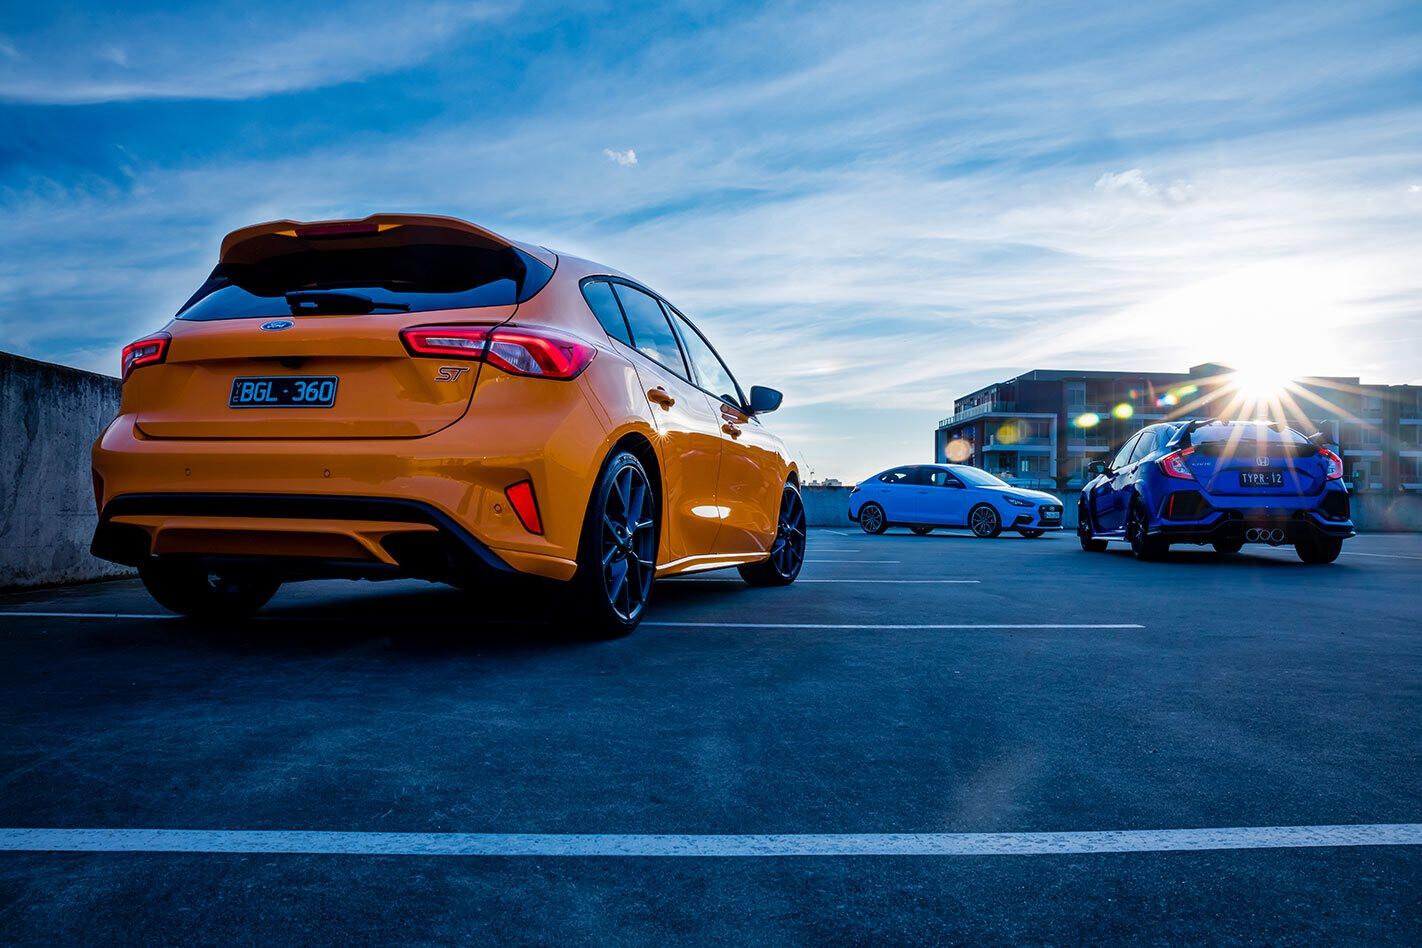 ford focus st vs honda civic type r vs hyundai i30 n fastback comparison